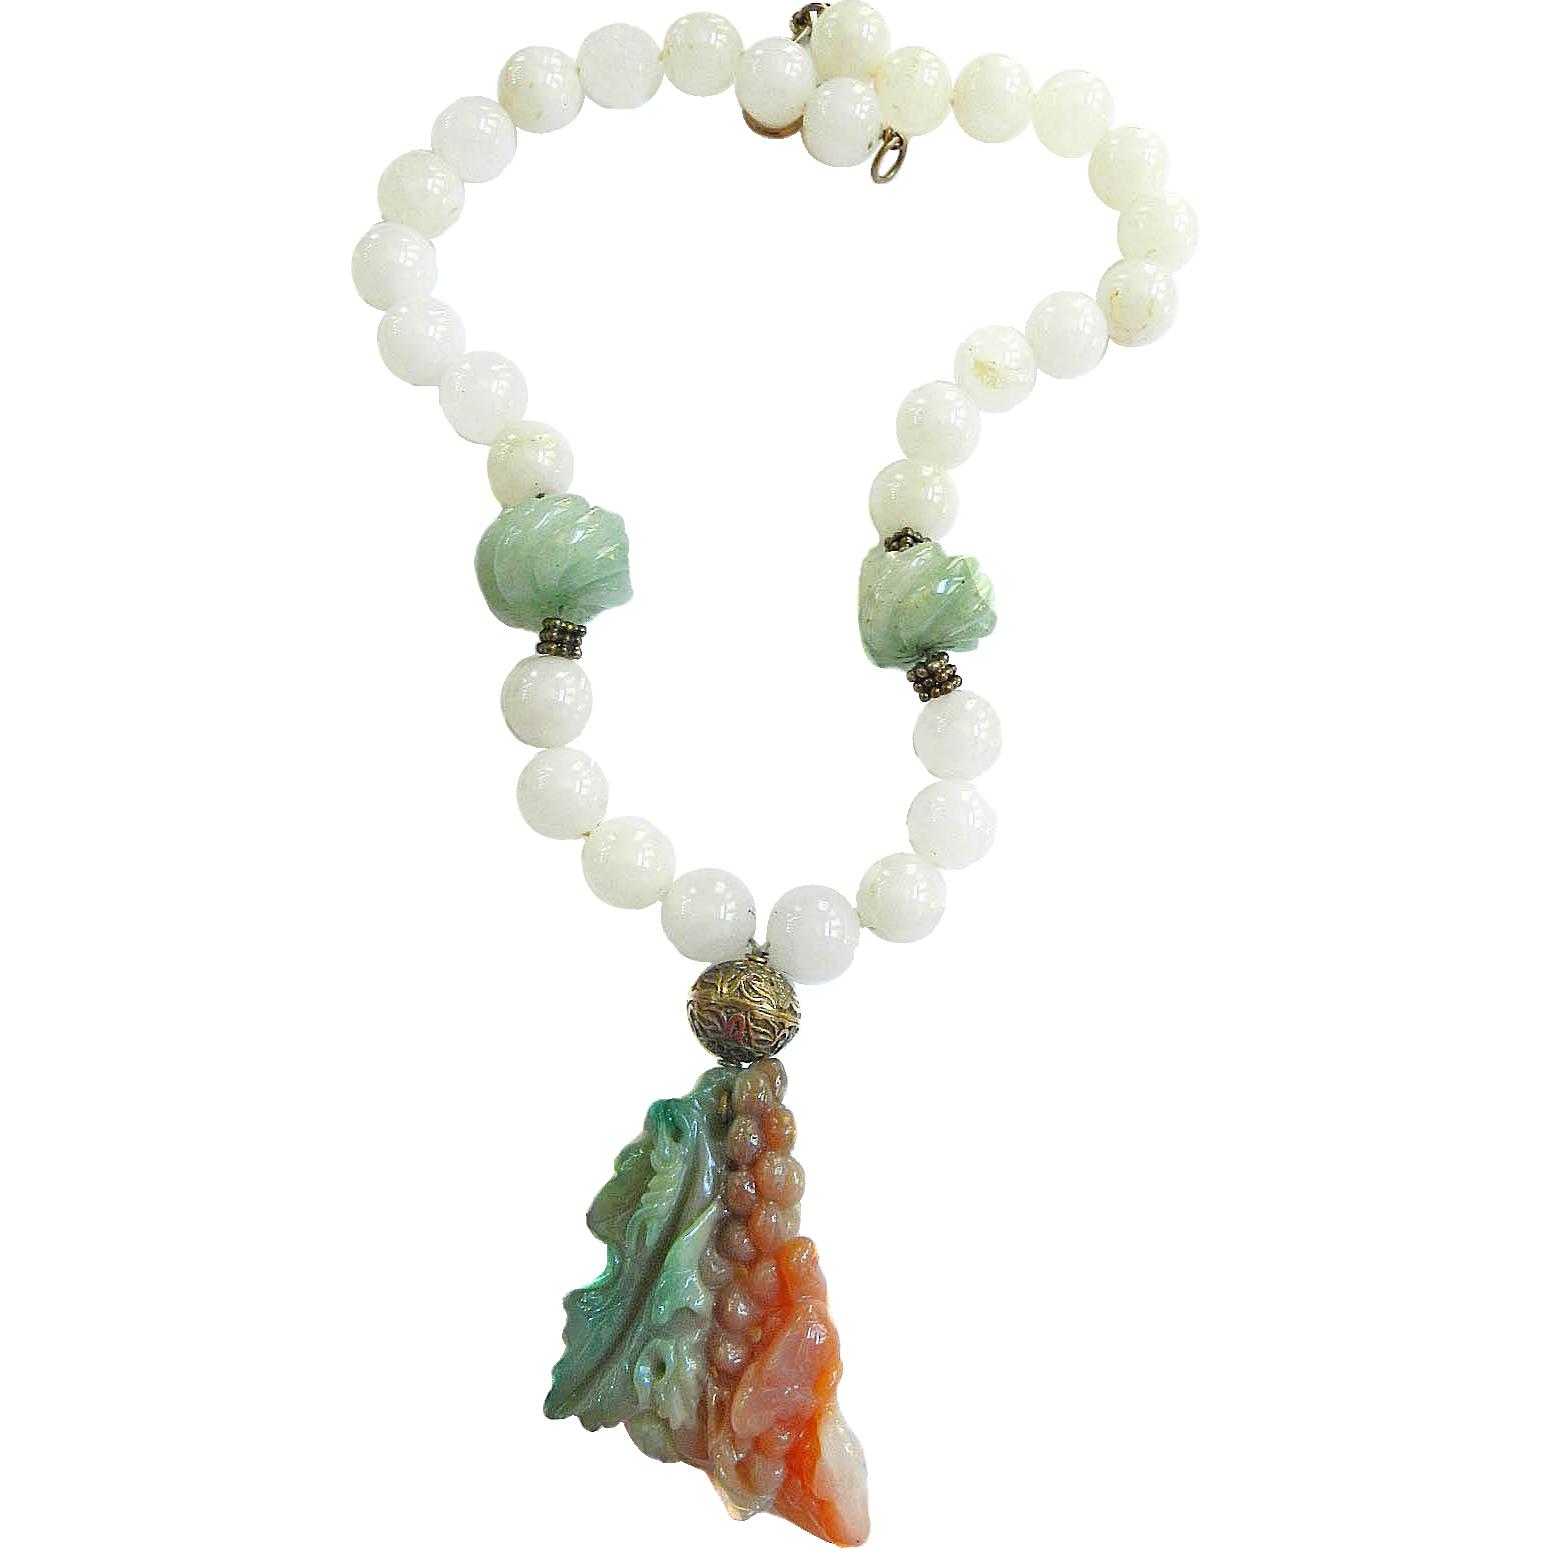 Massive Jadeite Grape Pendant Necklace